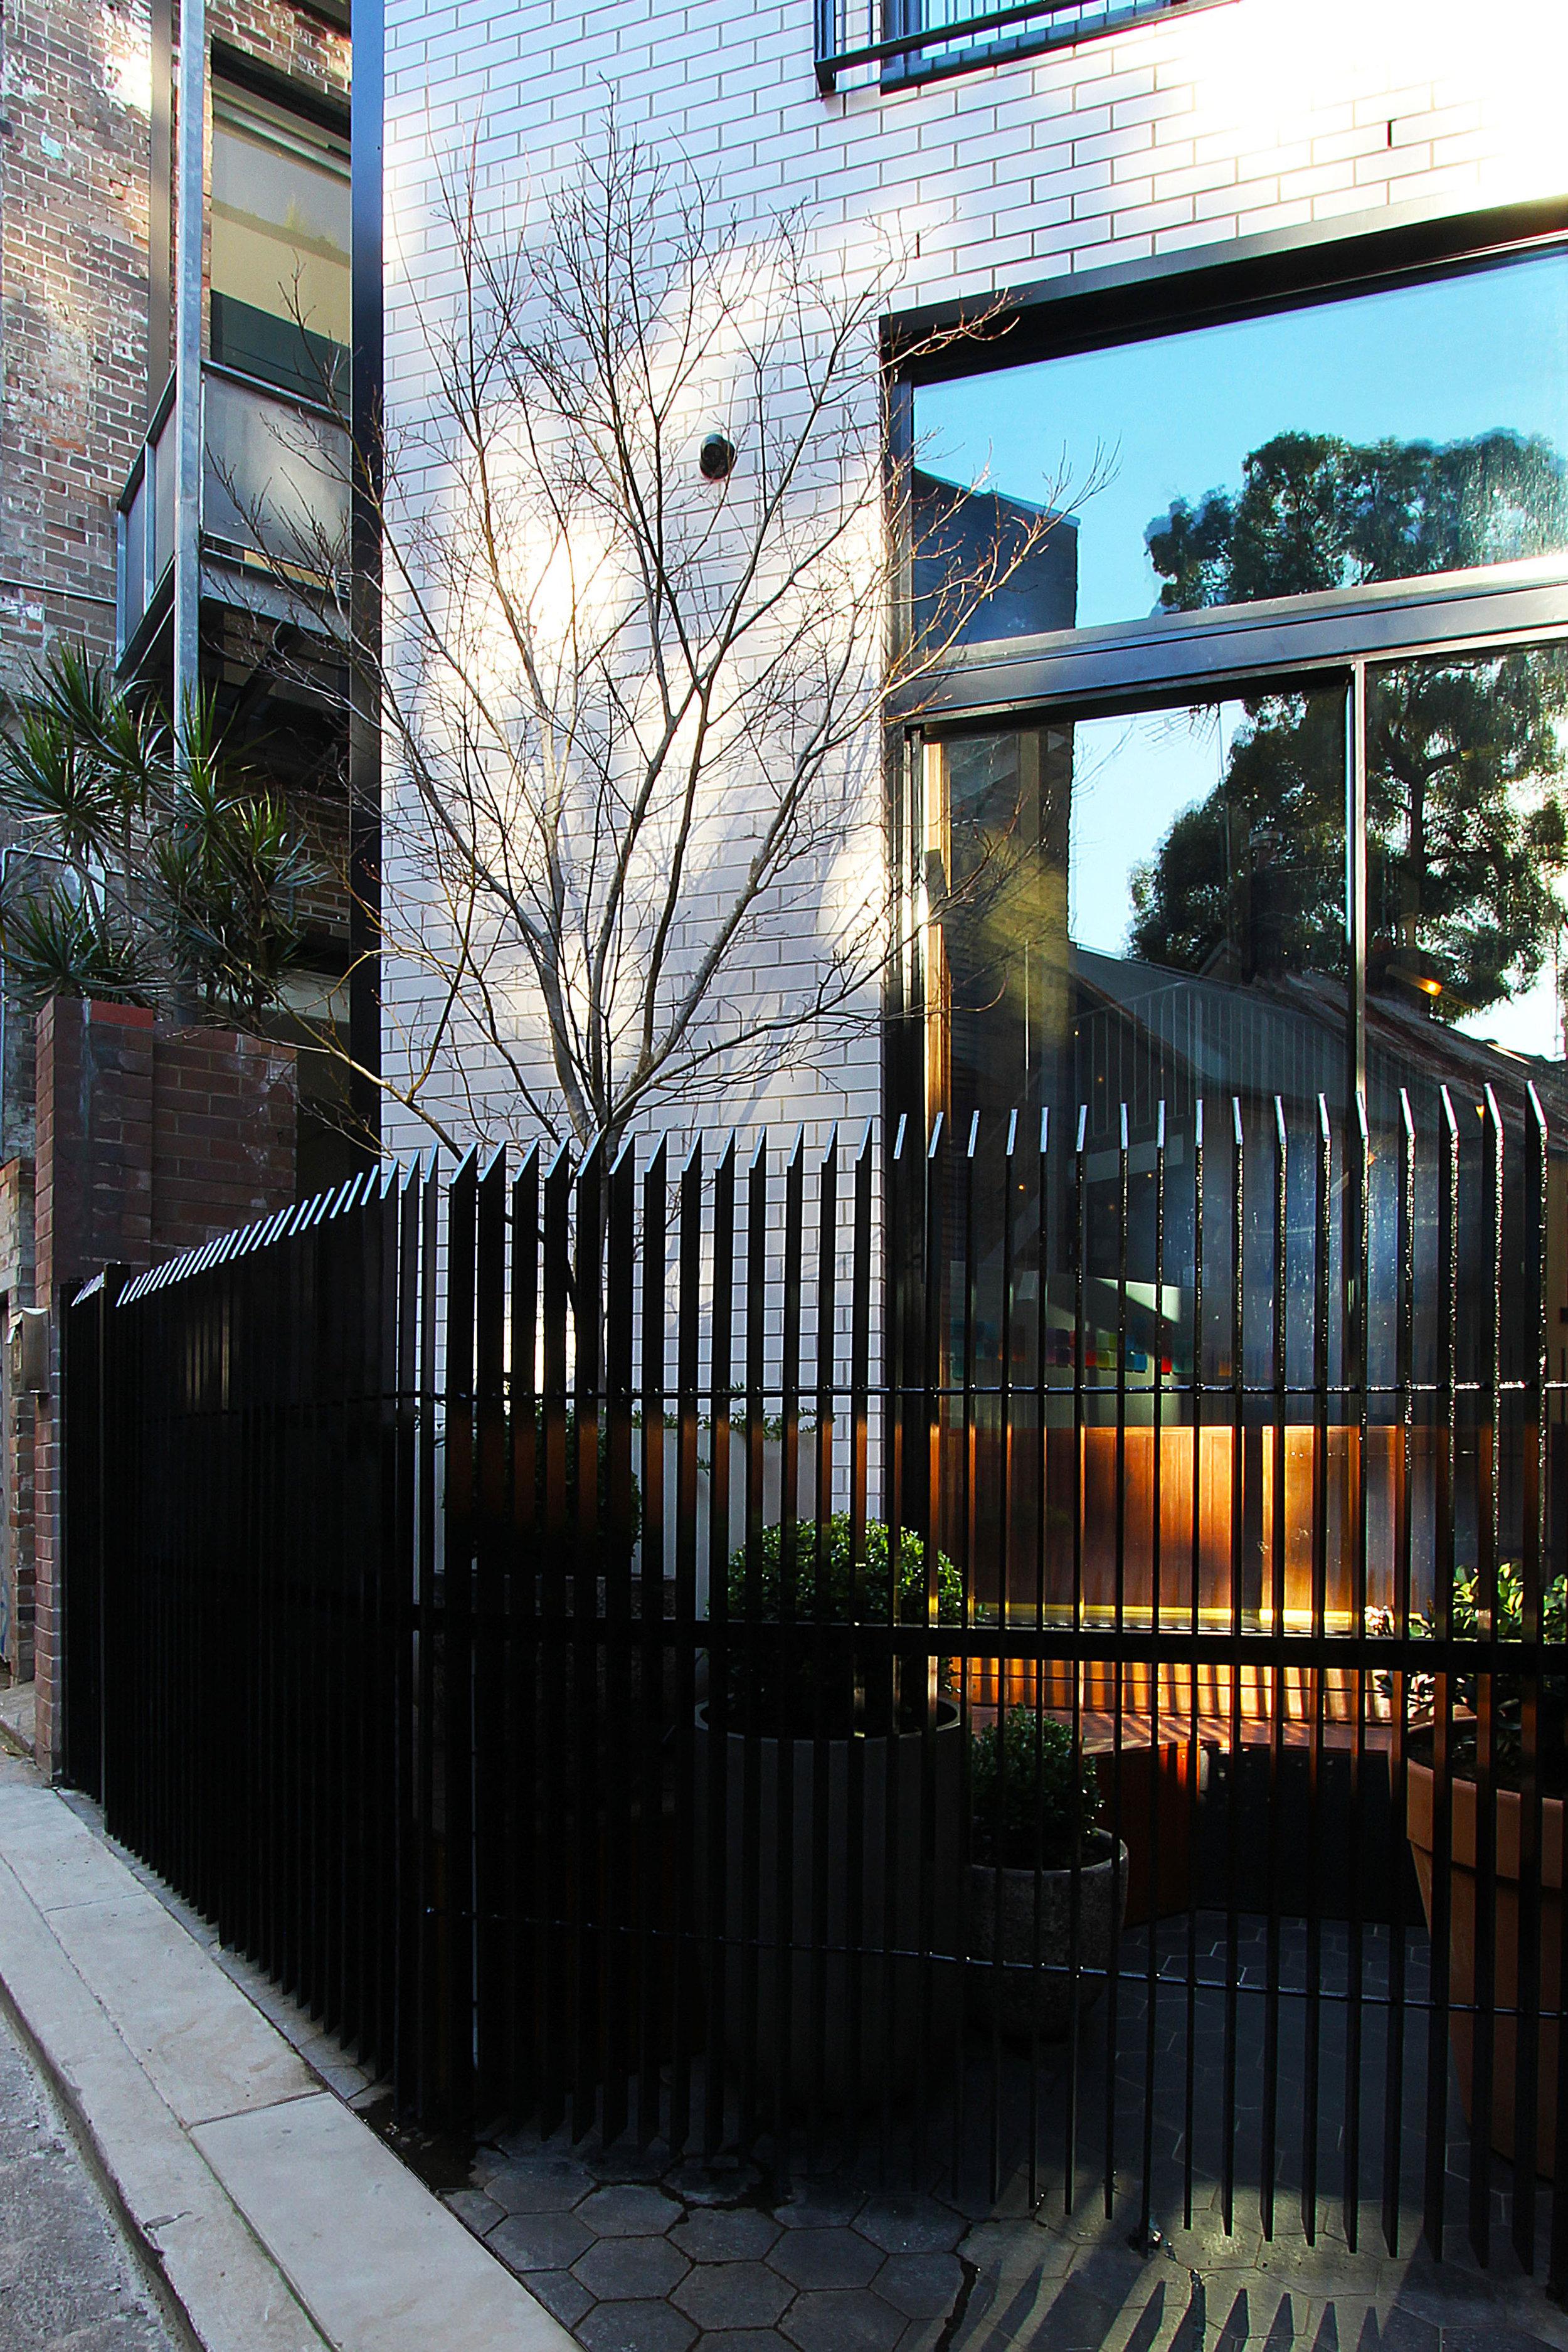 TYA Photography | Little Albion Guest House | Little Albion Street | Fencing | Winter | Arvo 01B | A7654.jpg